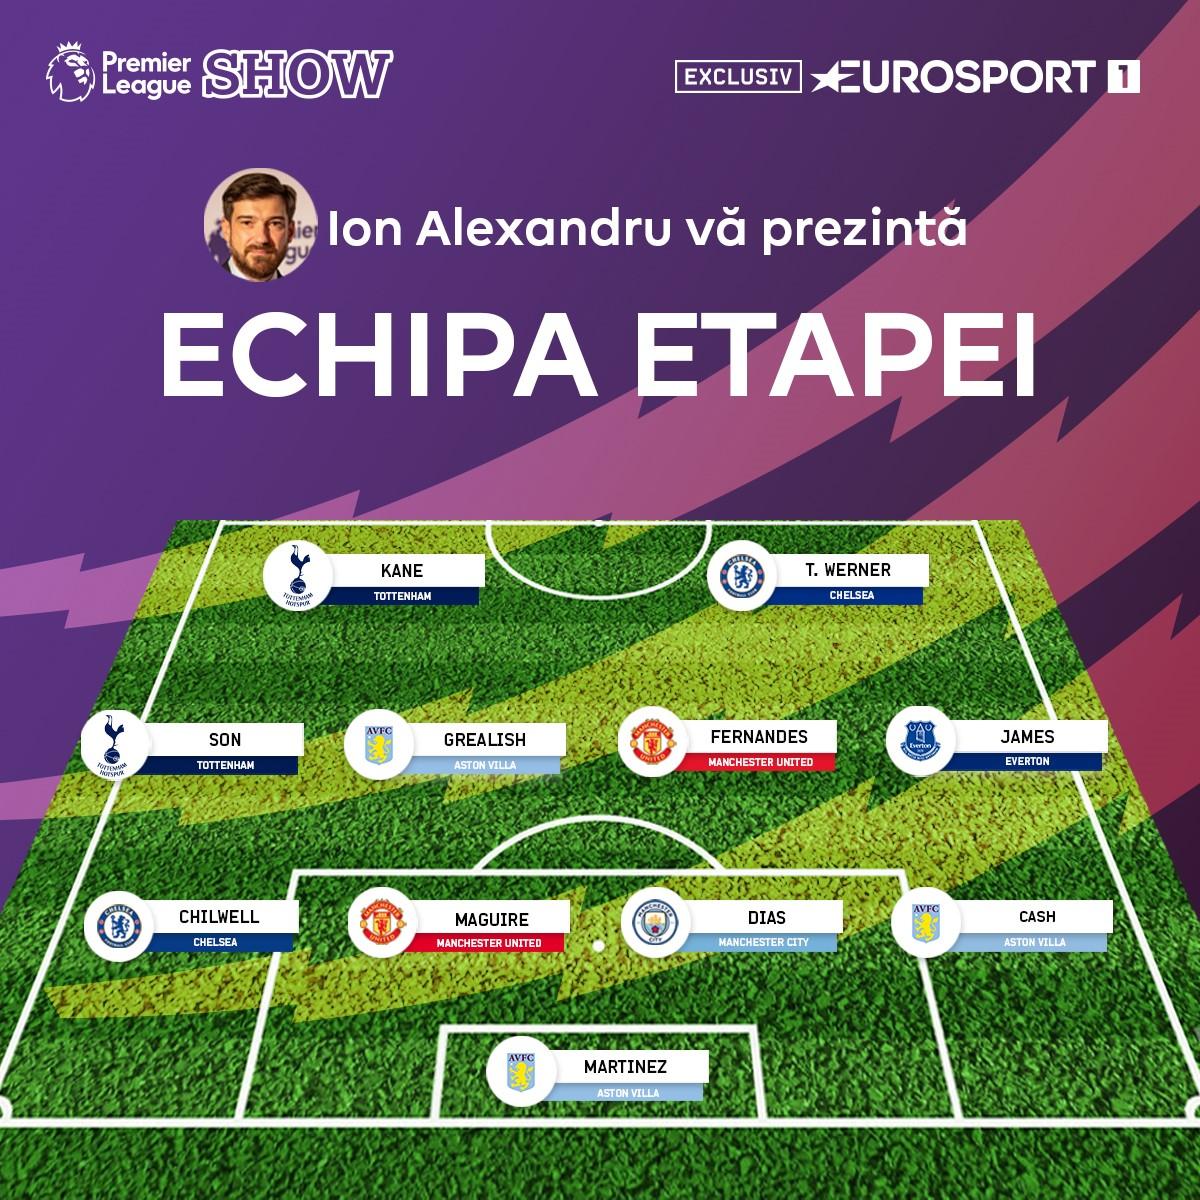 https://i.eurosport.com/2020/10/20/2918425.jpg